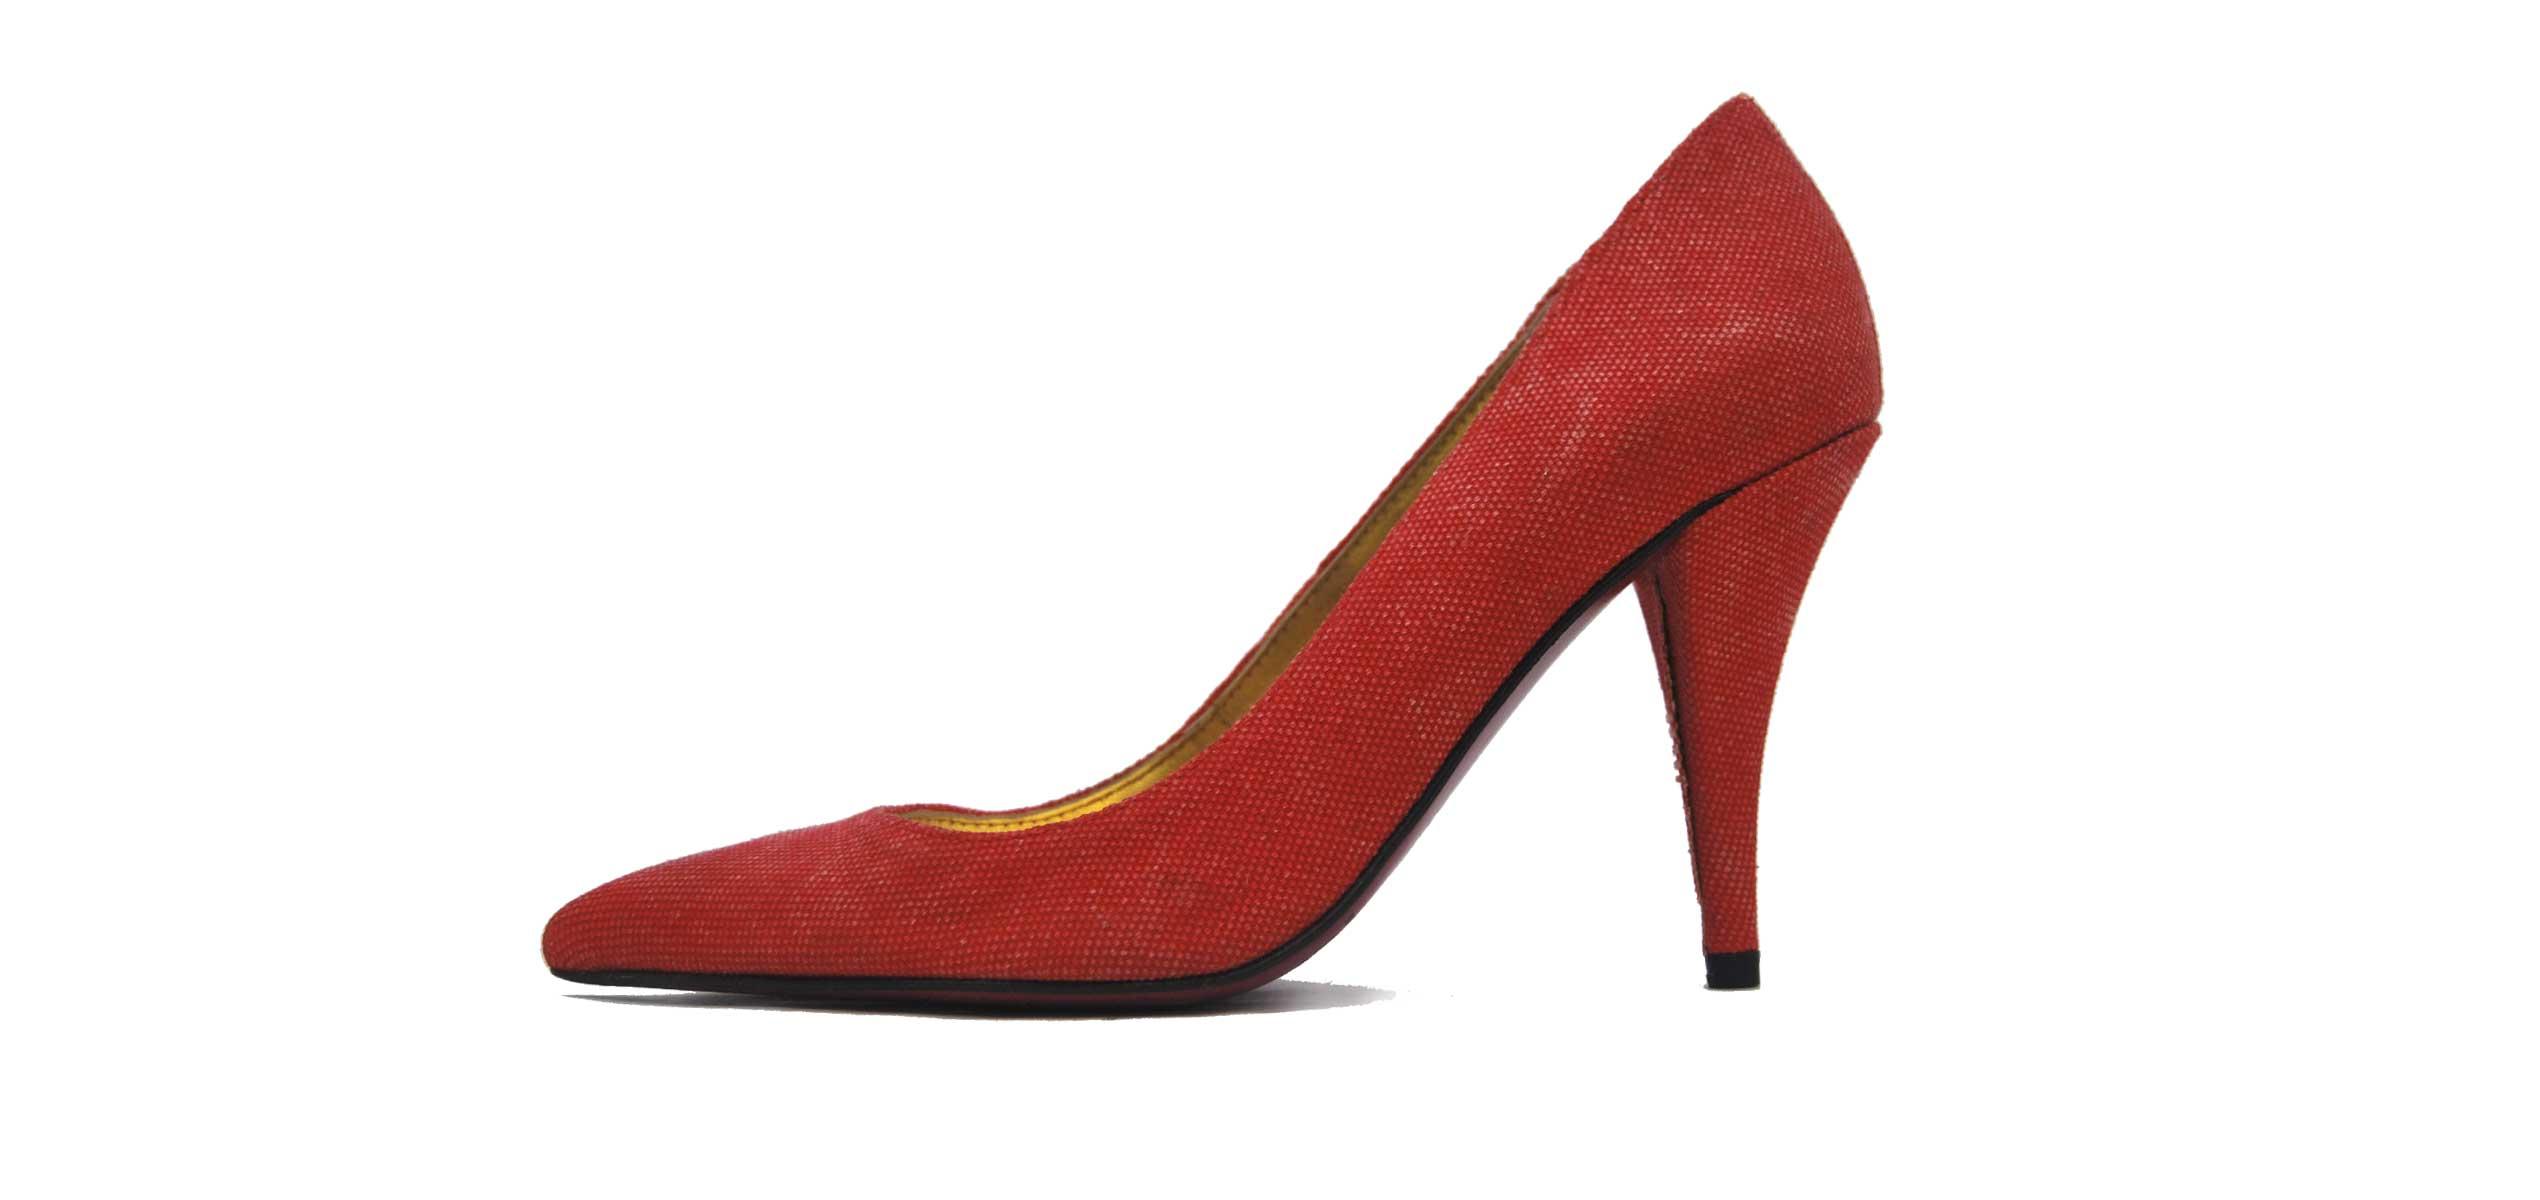 Foto 1 de Zapato Tacon Rojo